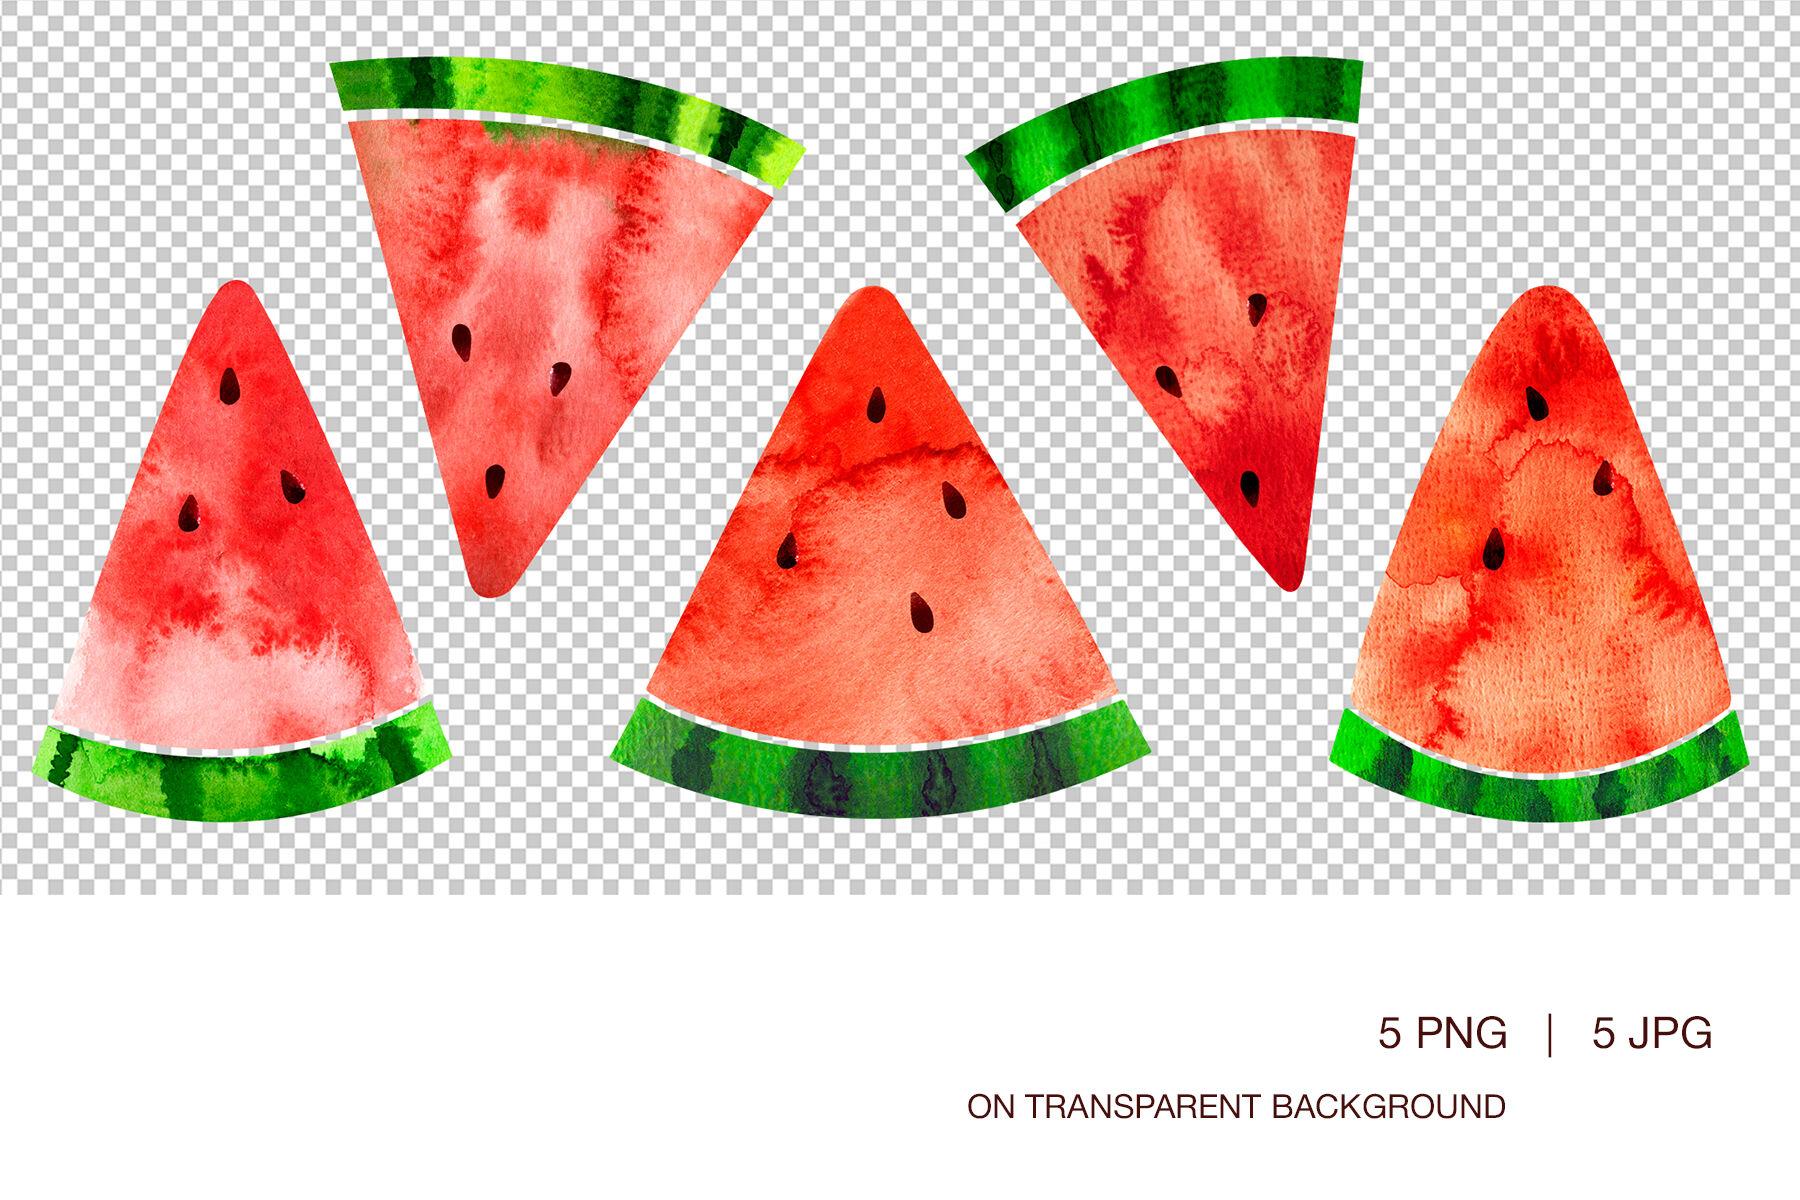 Watermelon Slices Digital Clipart Watecolor Illustrations By Viktorialapshyna Thehungryjpeg Com